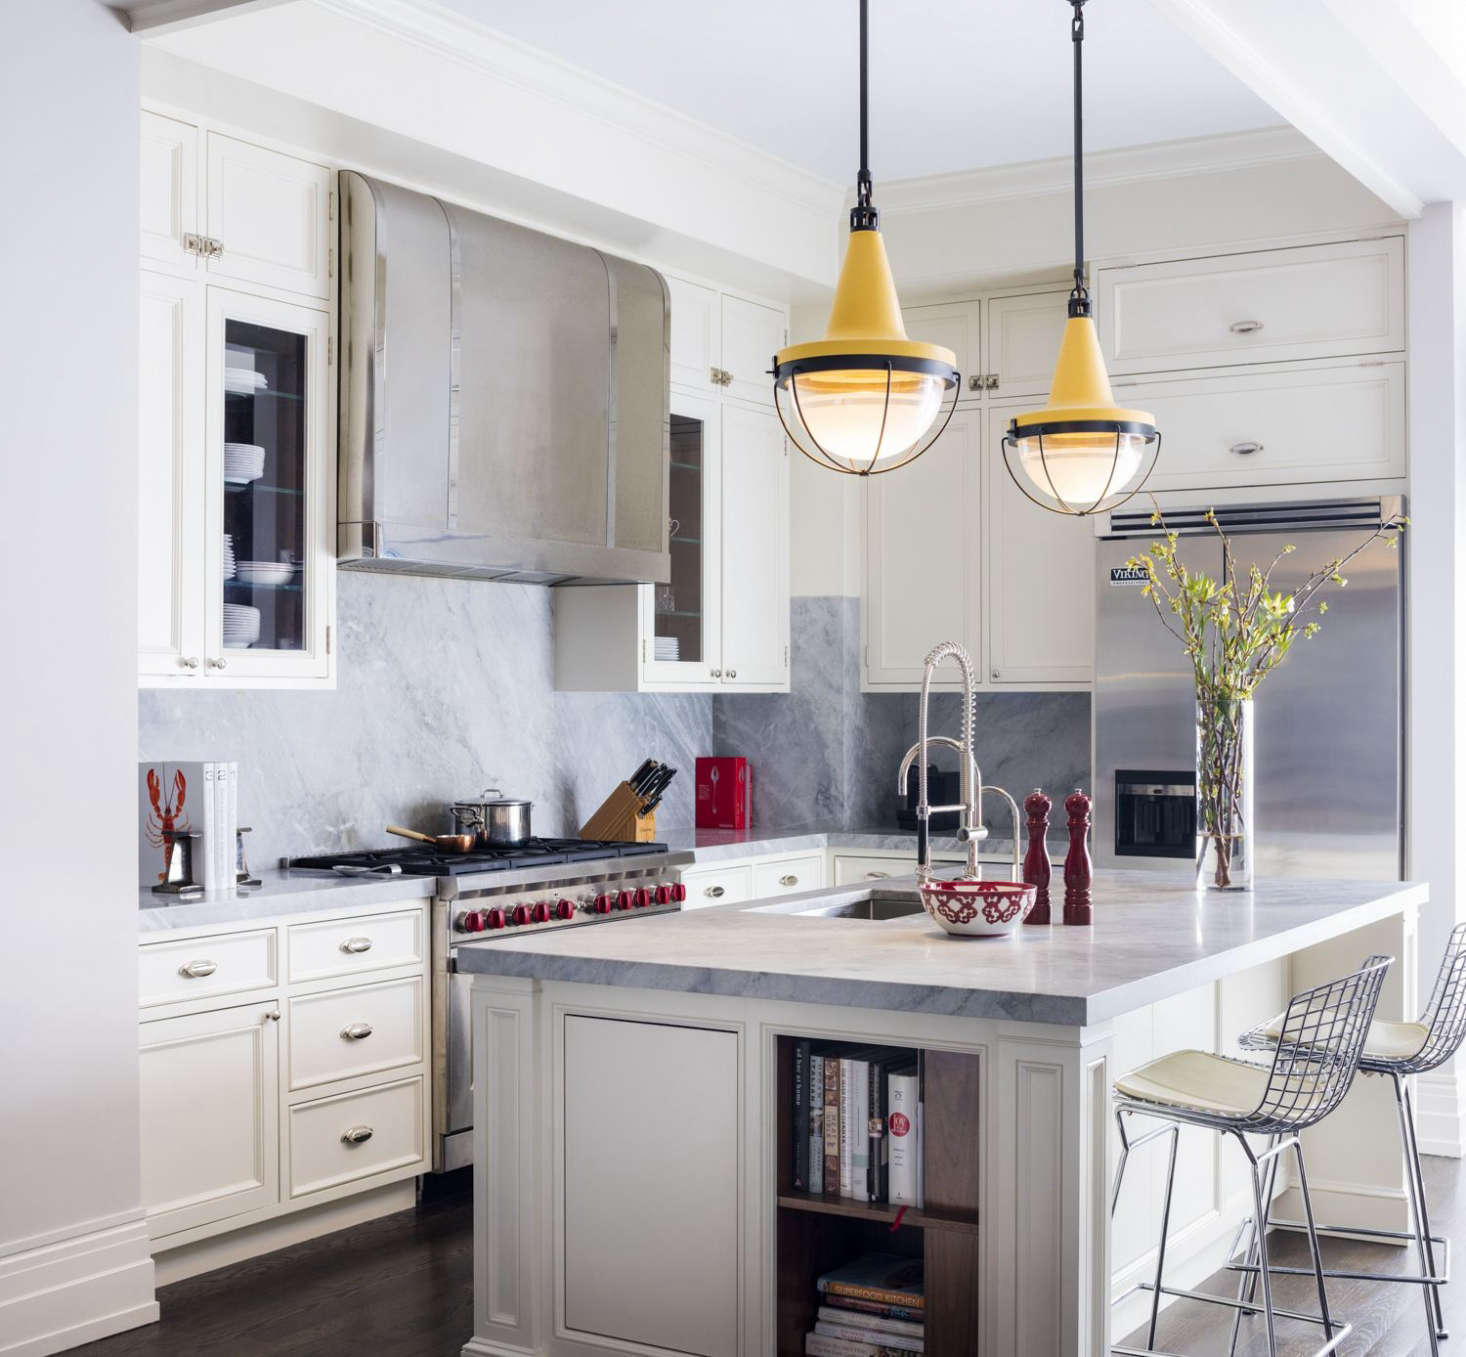 Tribeca Loft Kitchen &#8